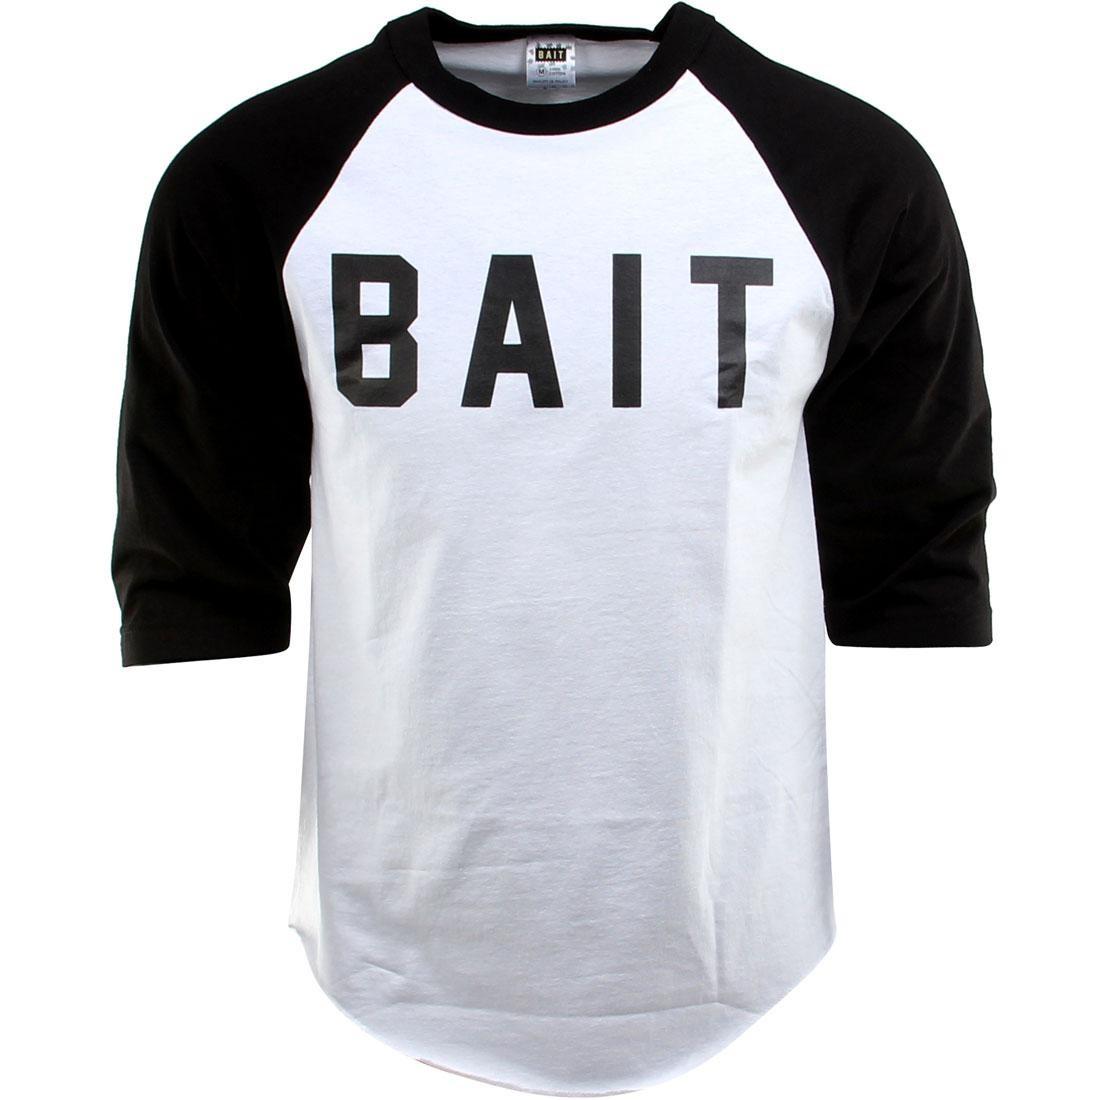 BAIT Logo Raglan Tee (white / black / black)